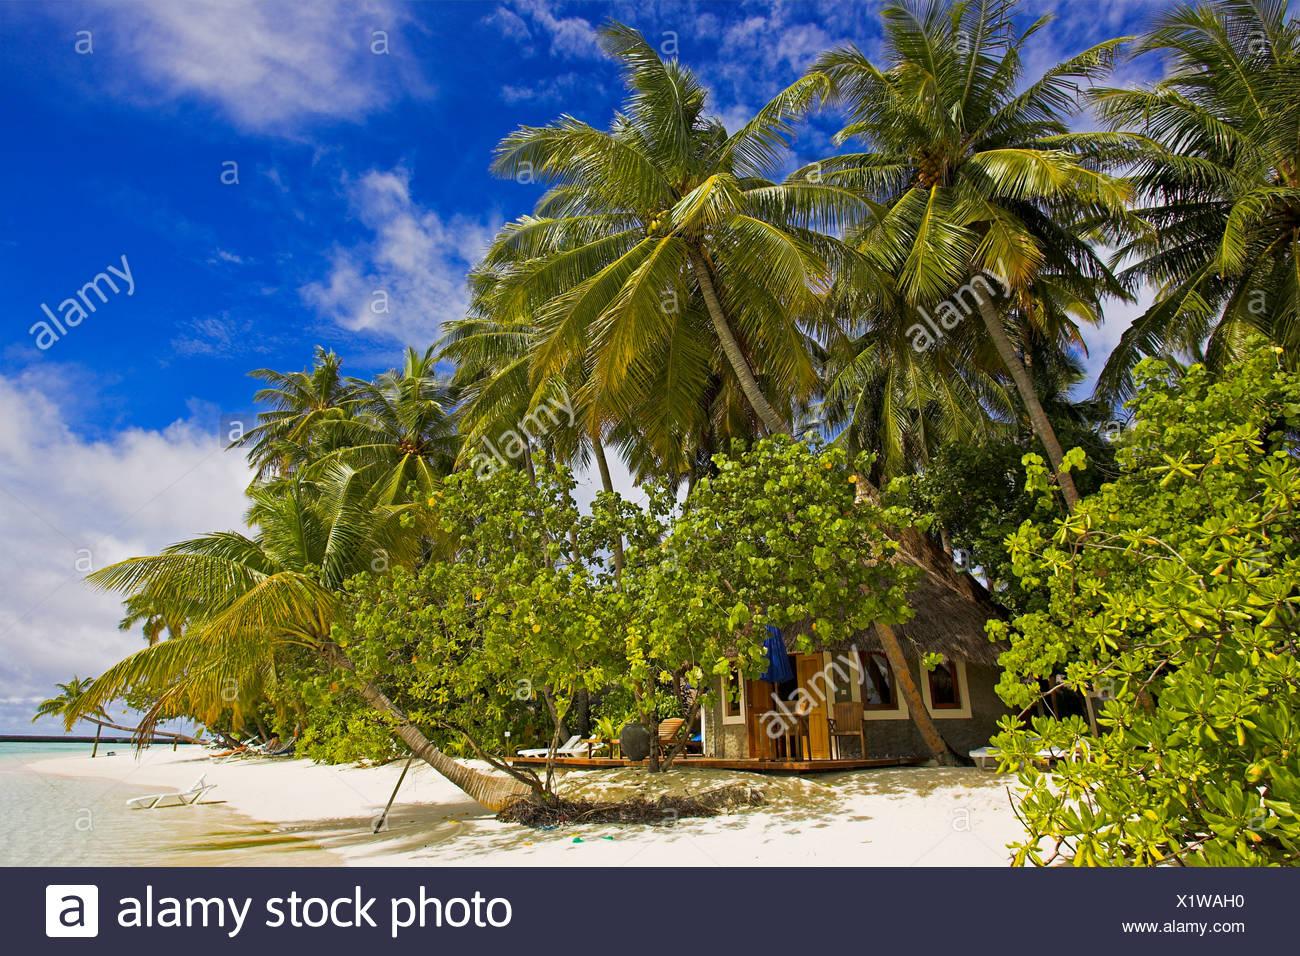 Bungalow on Vilureef Resort, Maledives. - Stock Image